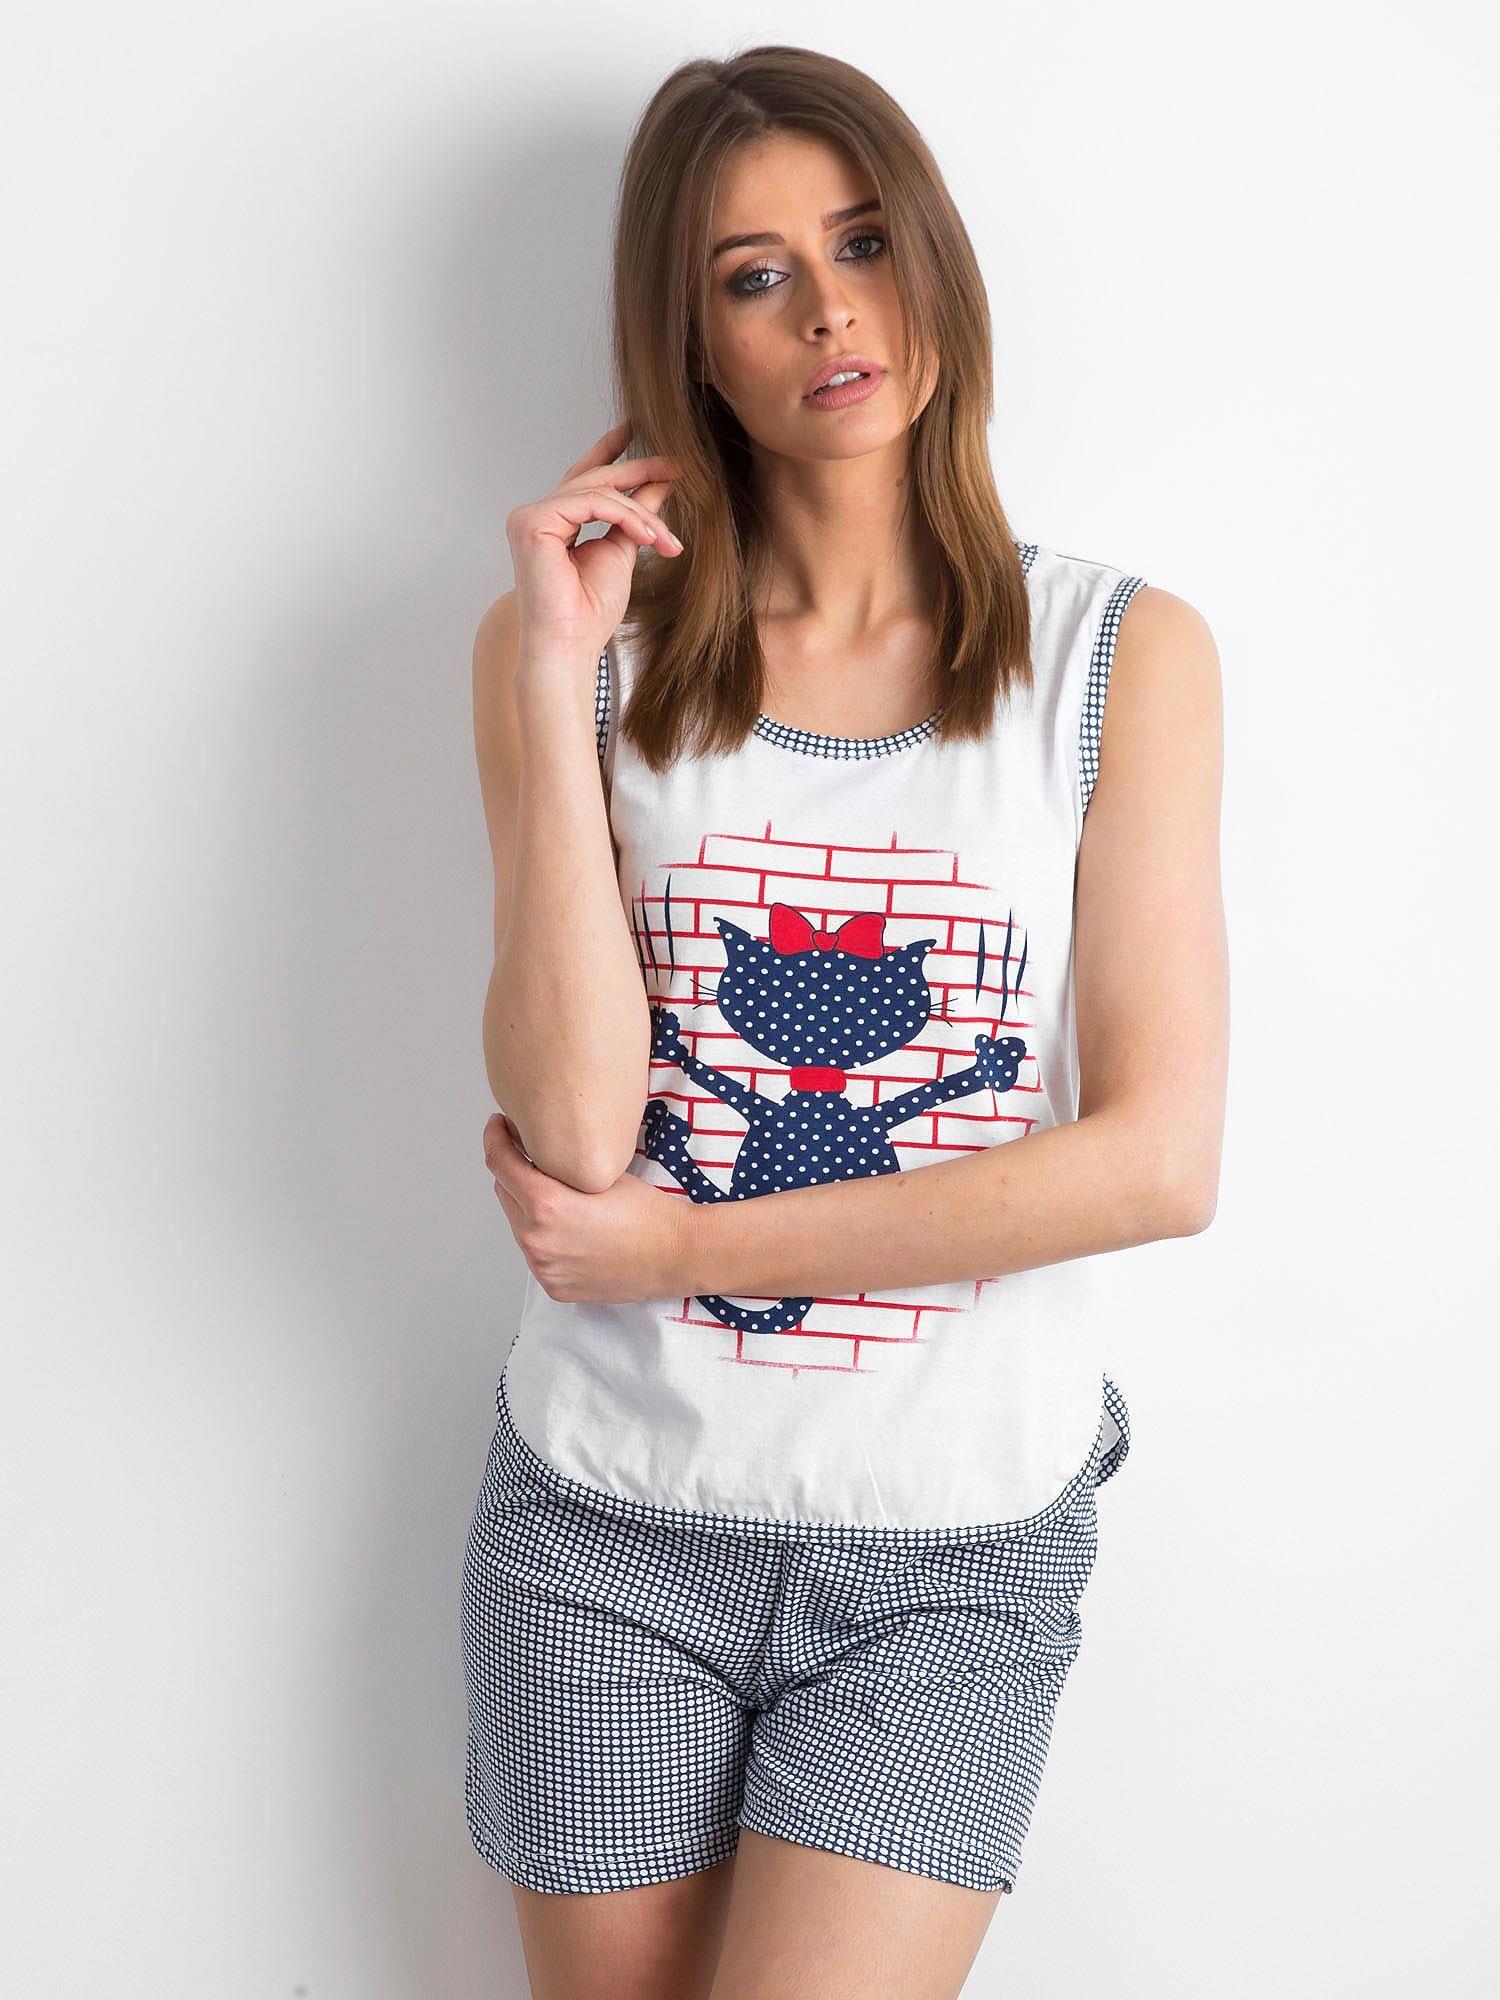 e48cebb0eb391c Biało-granatowa krótka piżama damska - Bielizna piżama - sklep eButik.pl